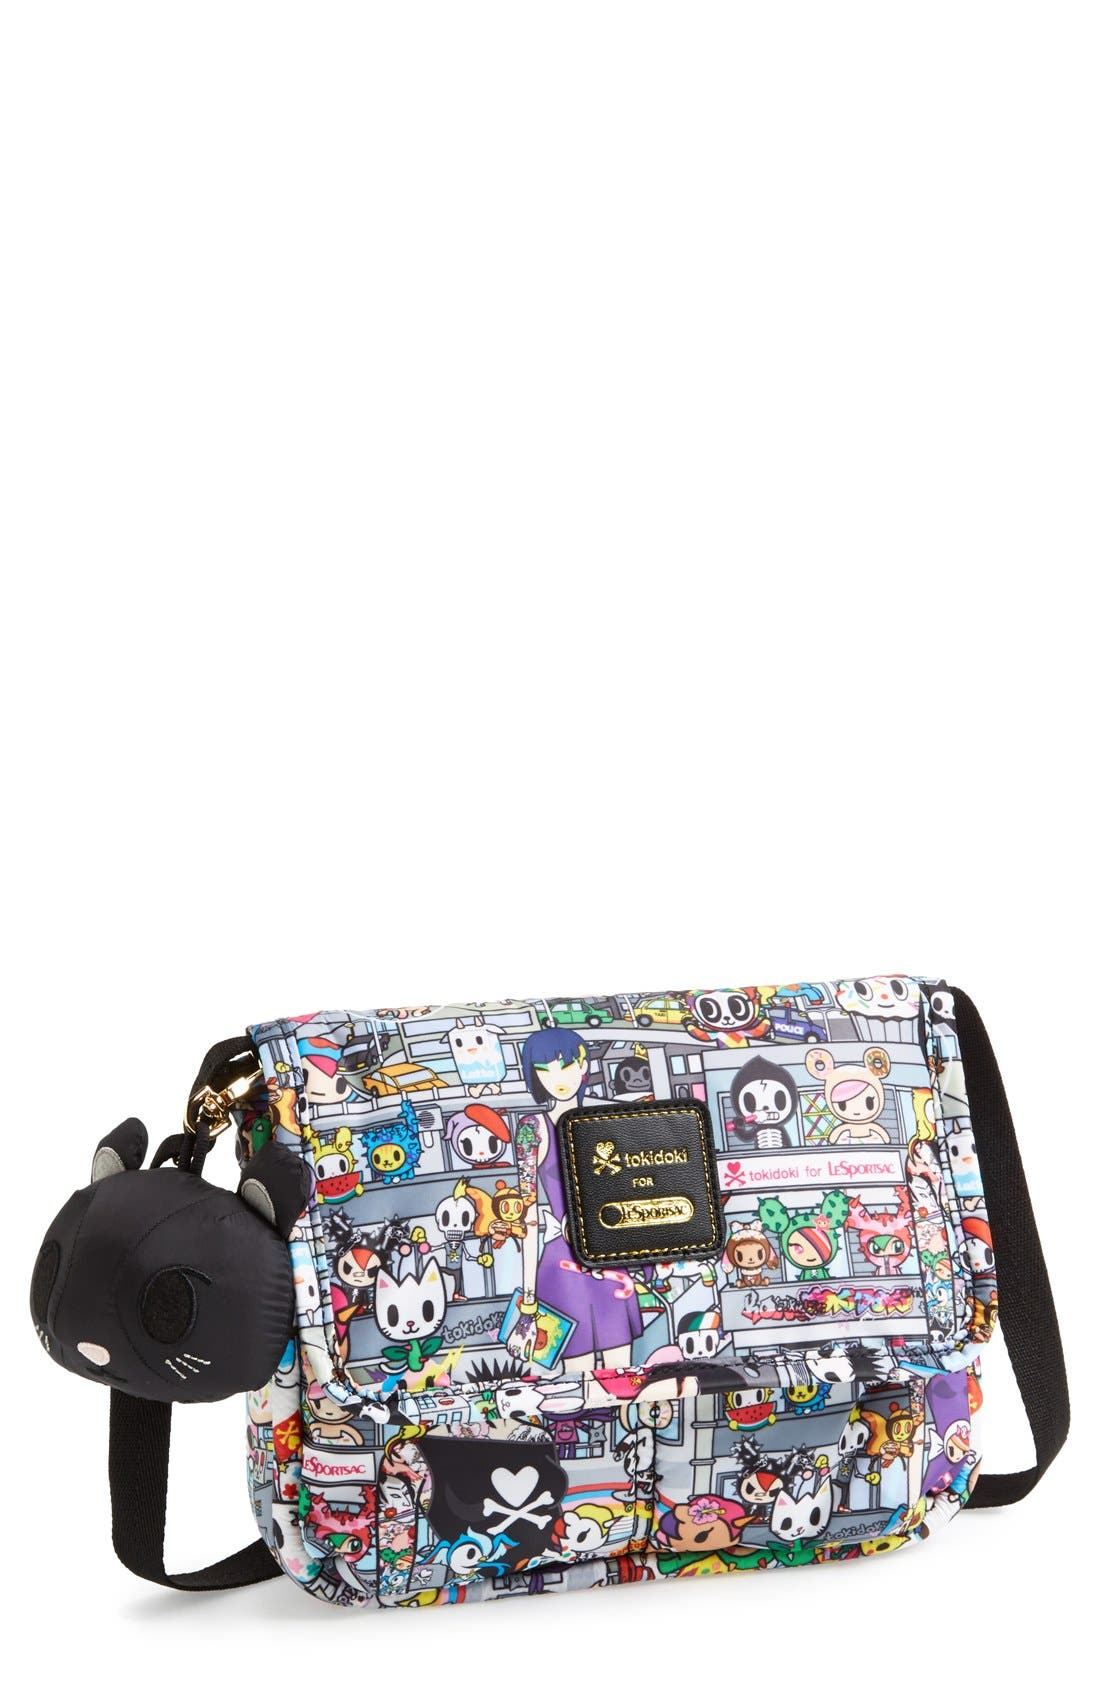 LESPORTSAC tokidoki x LeSportsac 'Gelatto' Crossbody Bag, Main, color, 020